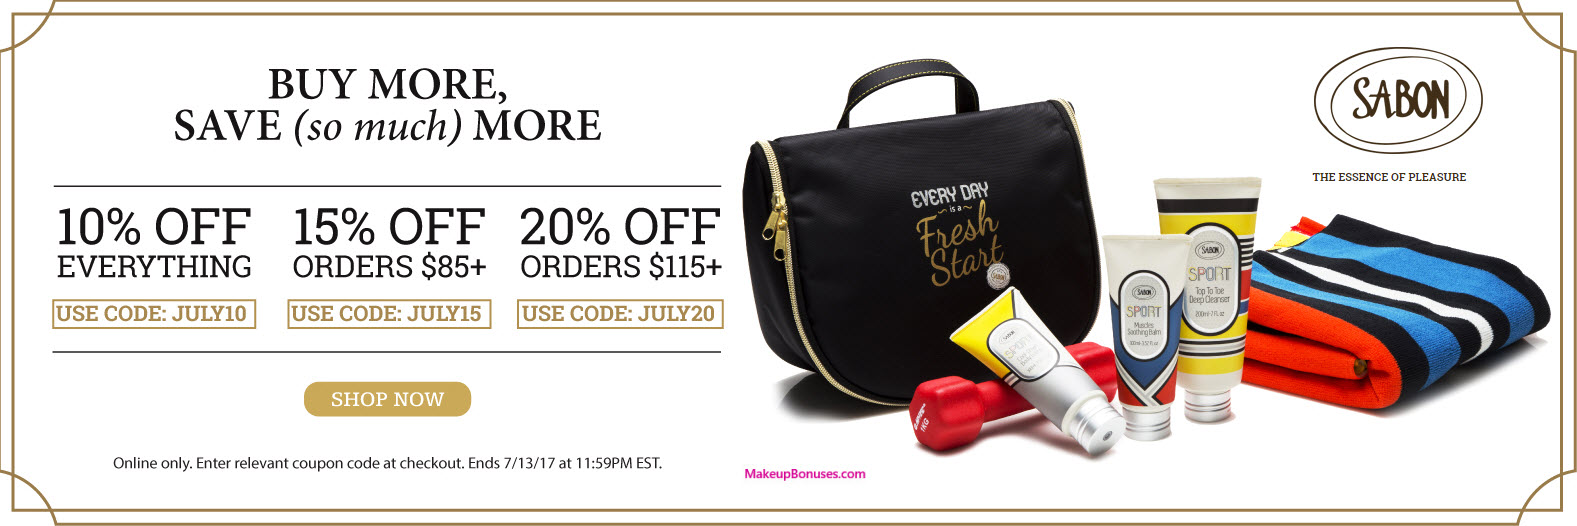 Sabon 20% Off - MakeupBonuses.com